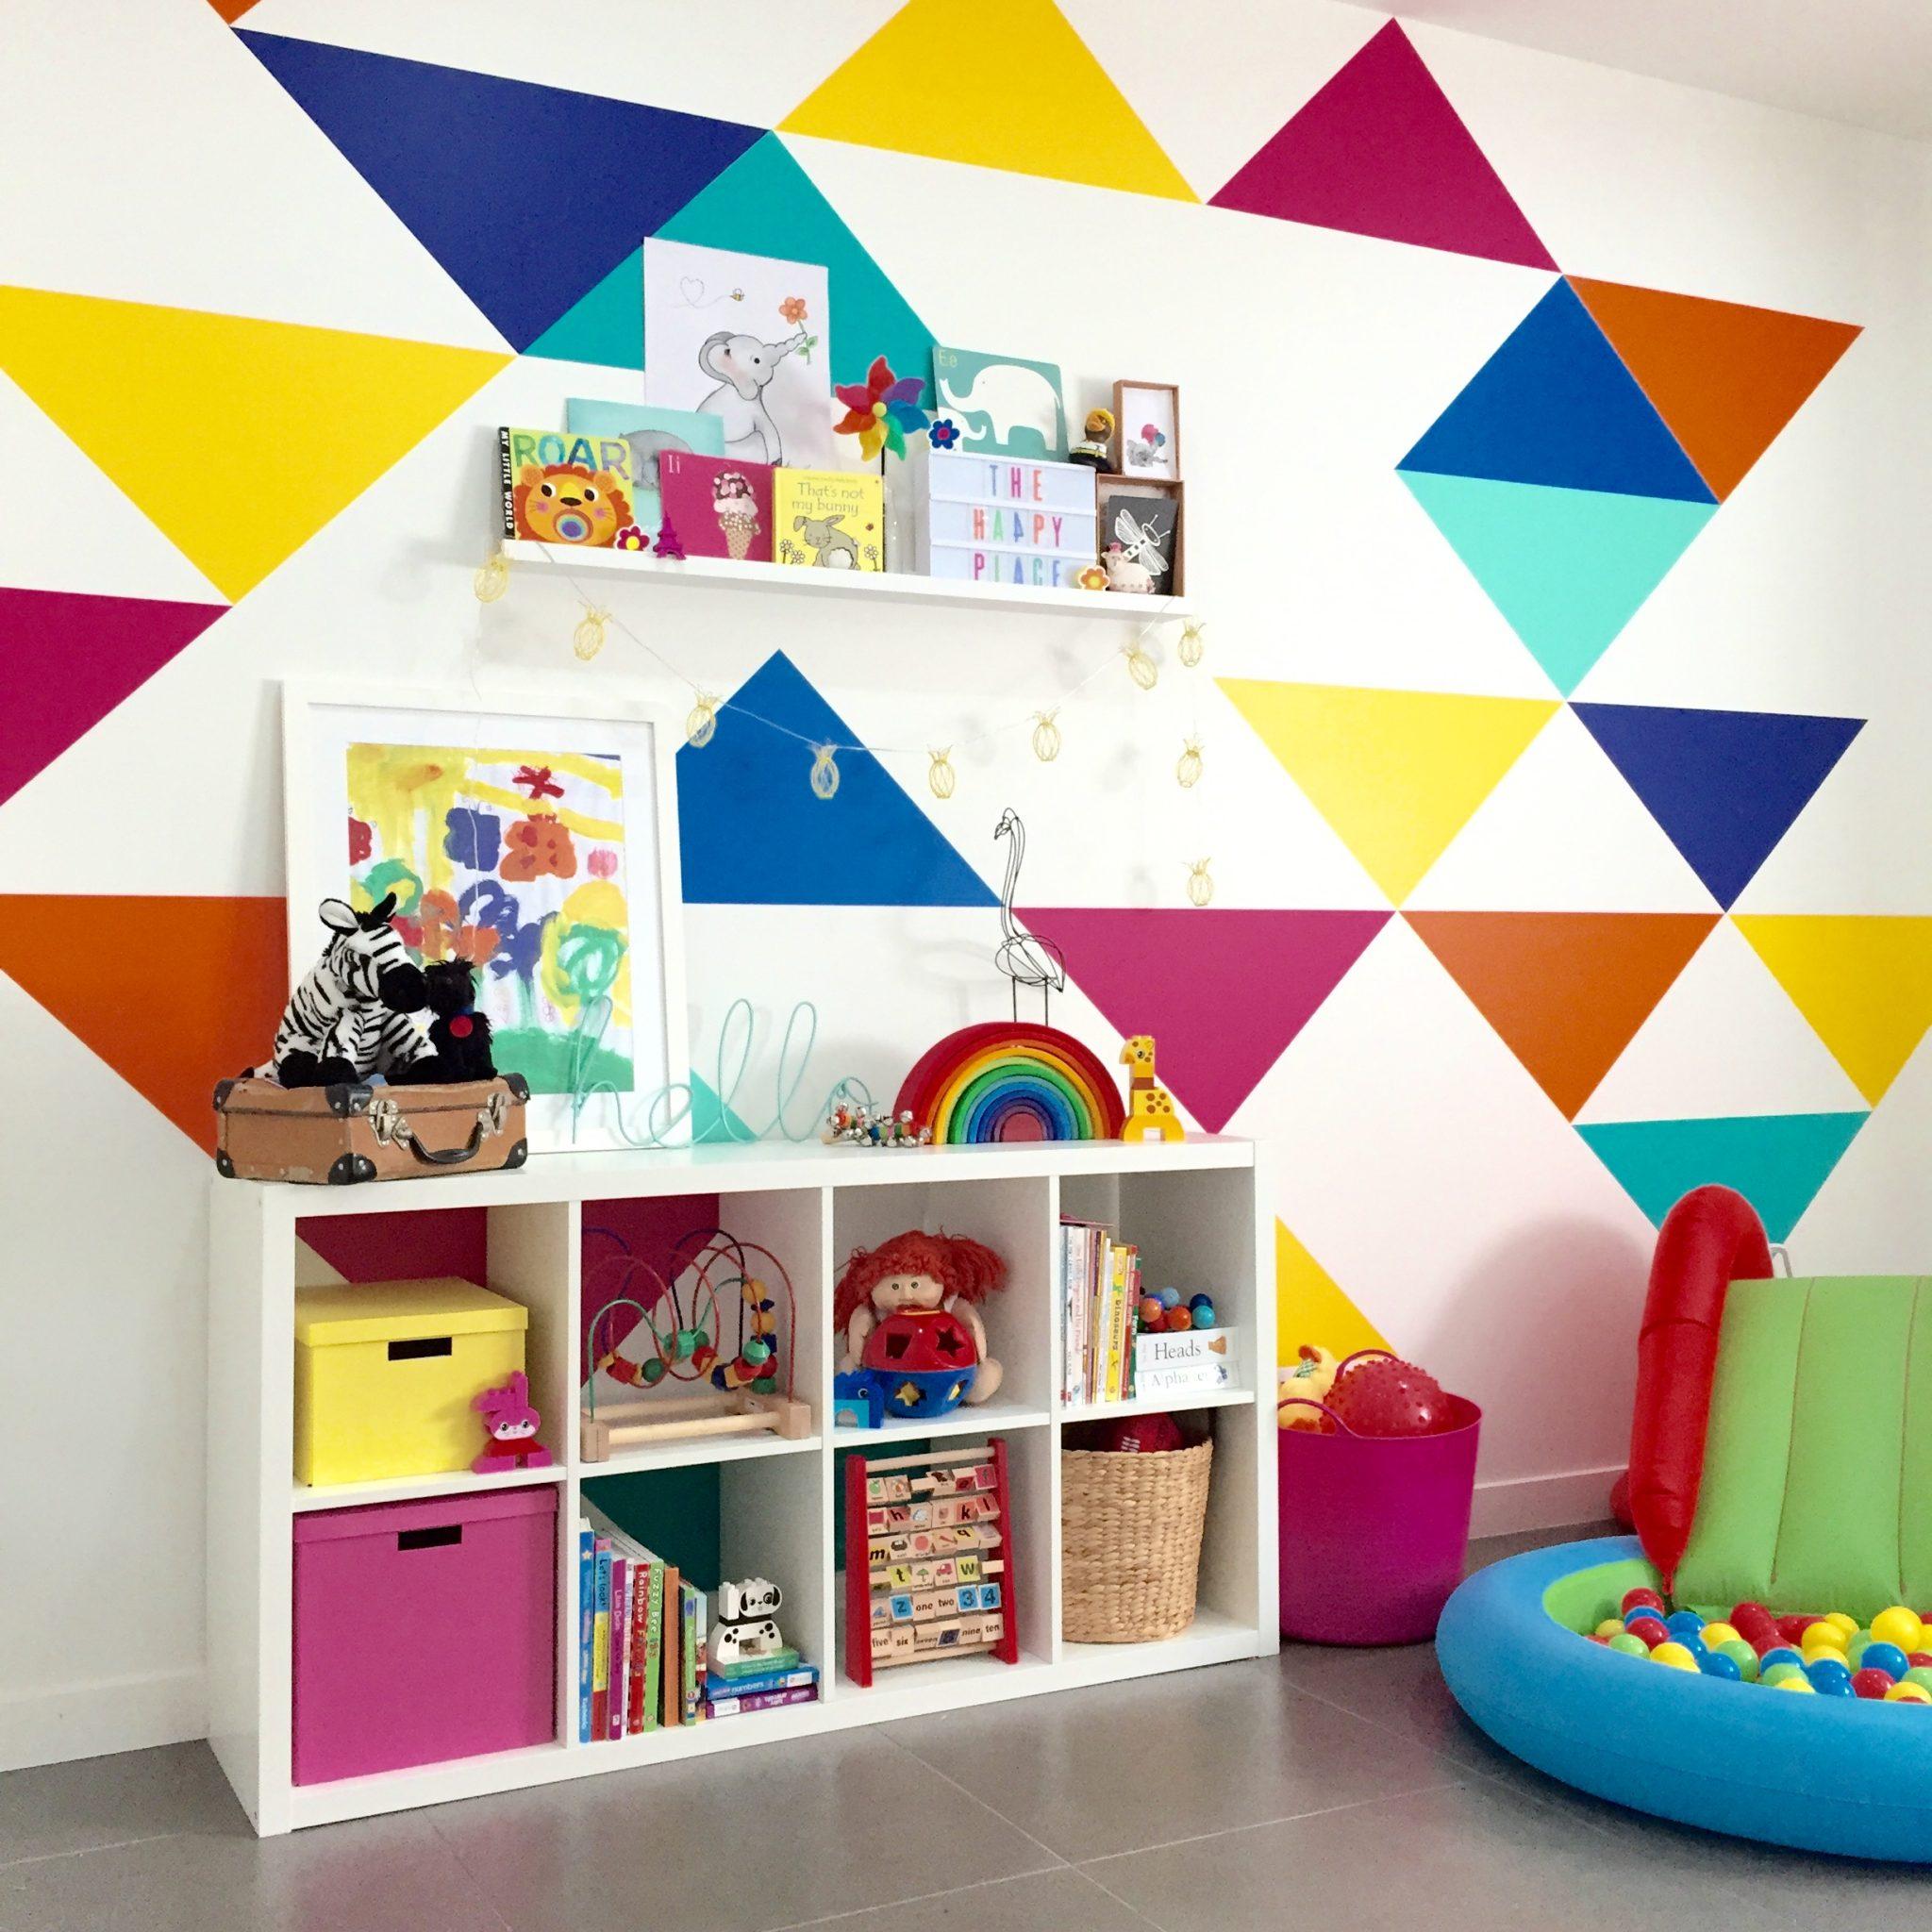 Colorful Playroom Design: Australian Nursery Ideas: With Vivid Wall Decals